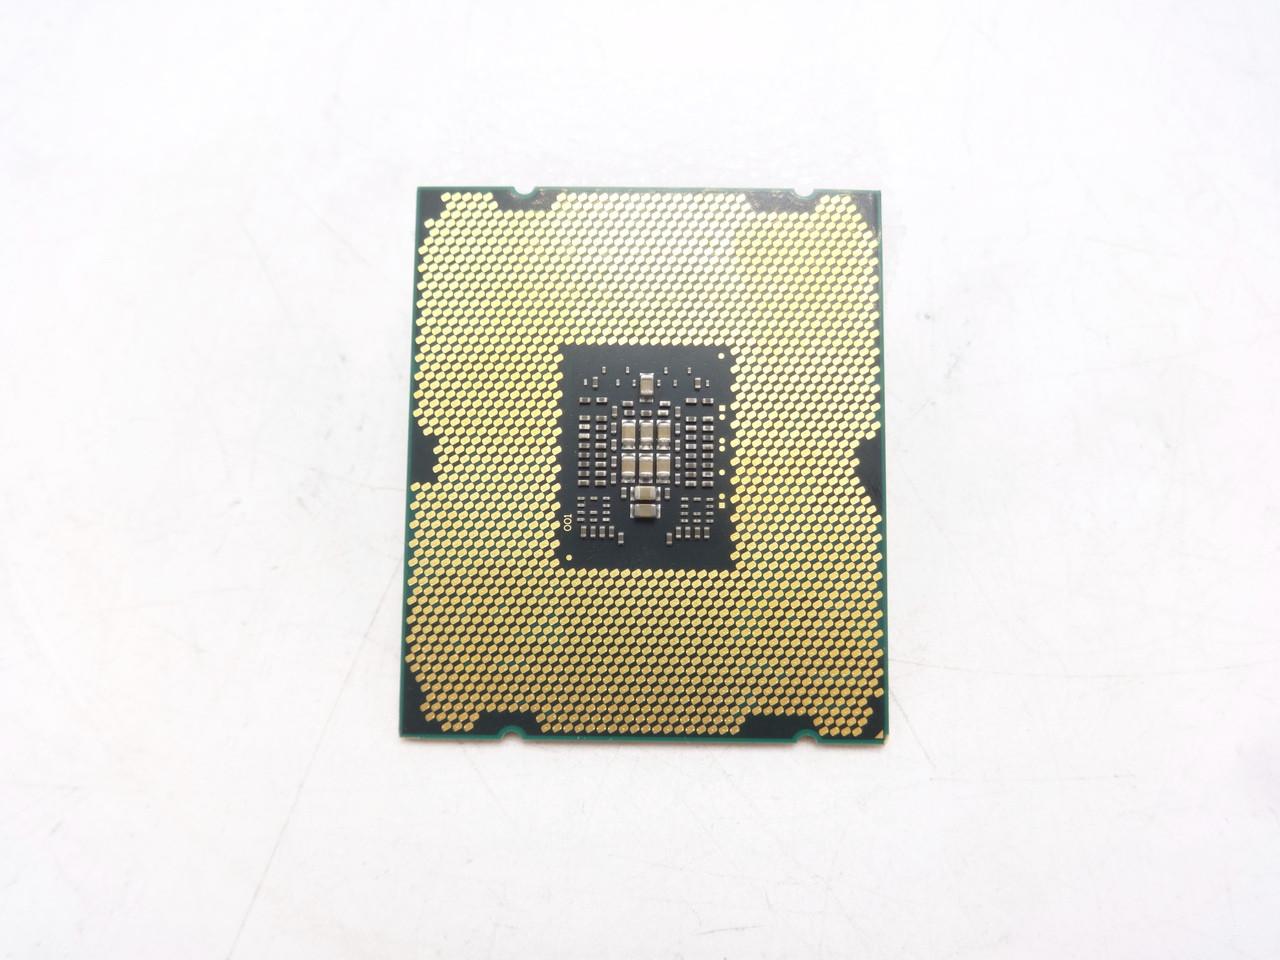 Intel Xeon E5-1620 3.6Ghz (3.8Ghz Turbo) Quad-Core CPU SR0LC Socket 2011